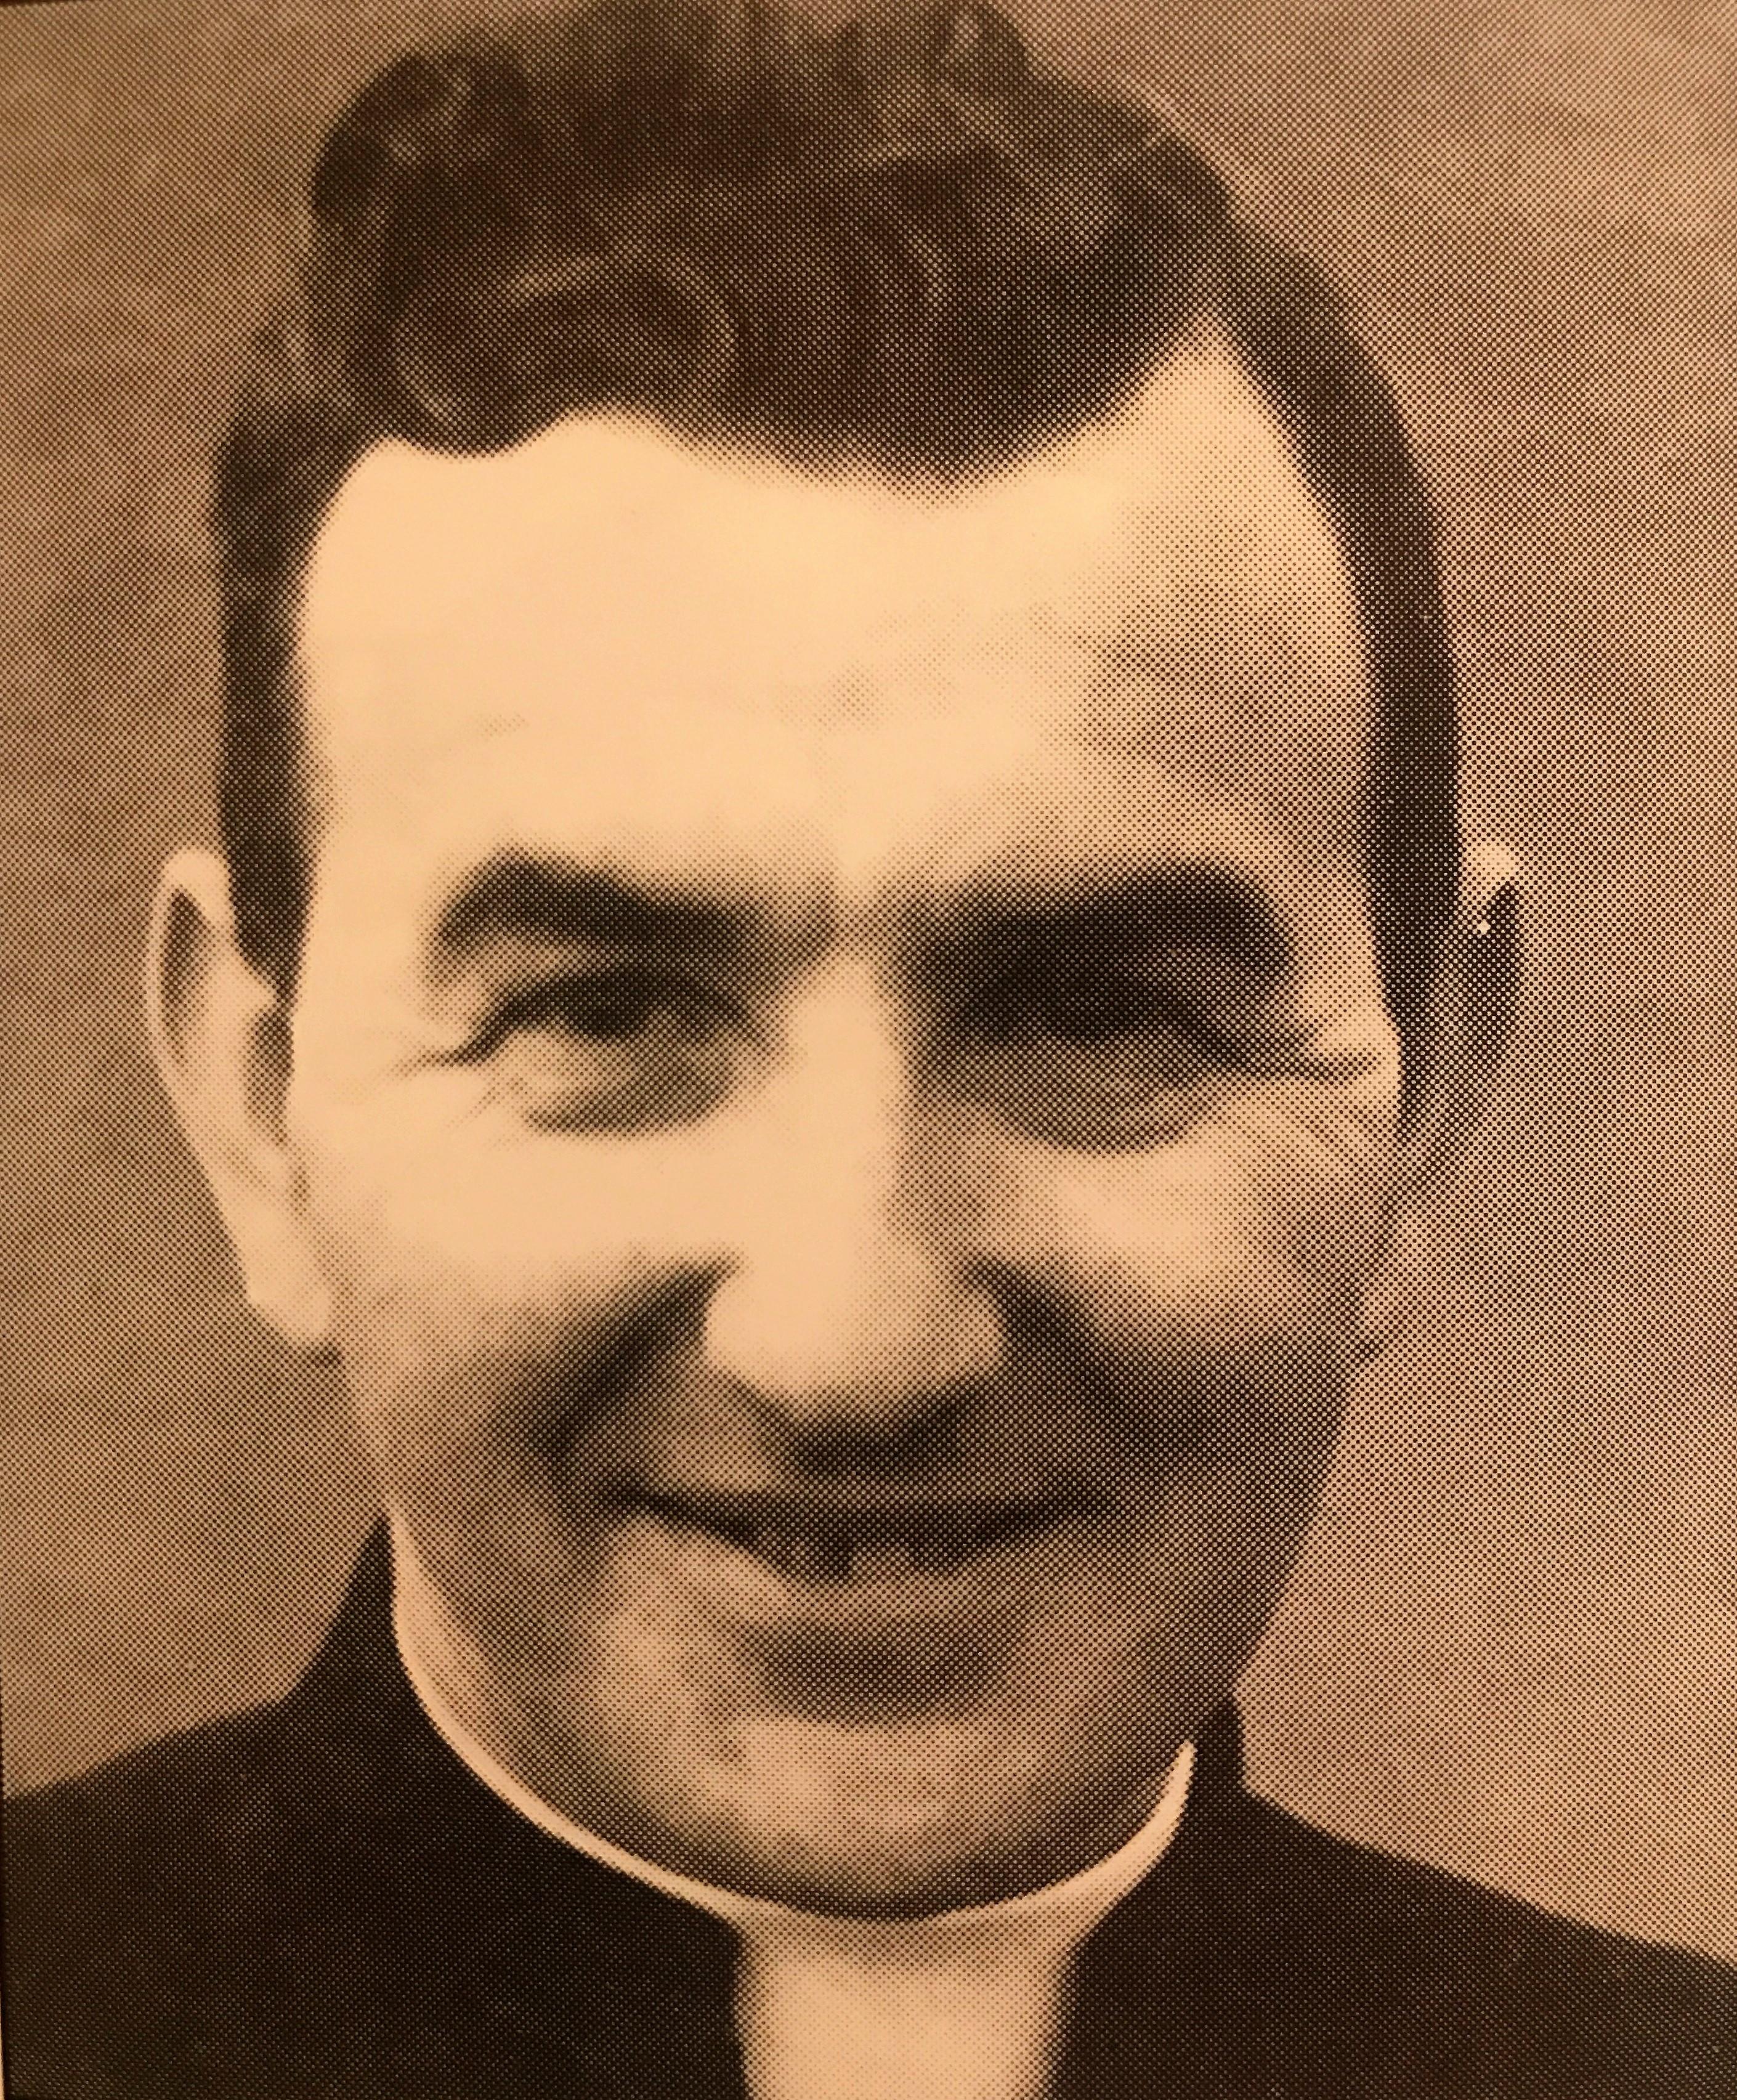 Rev. Denis Lucey